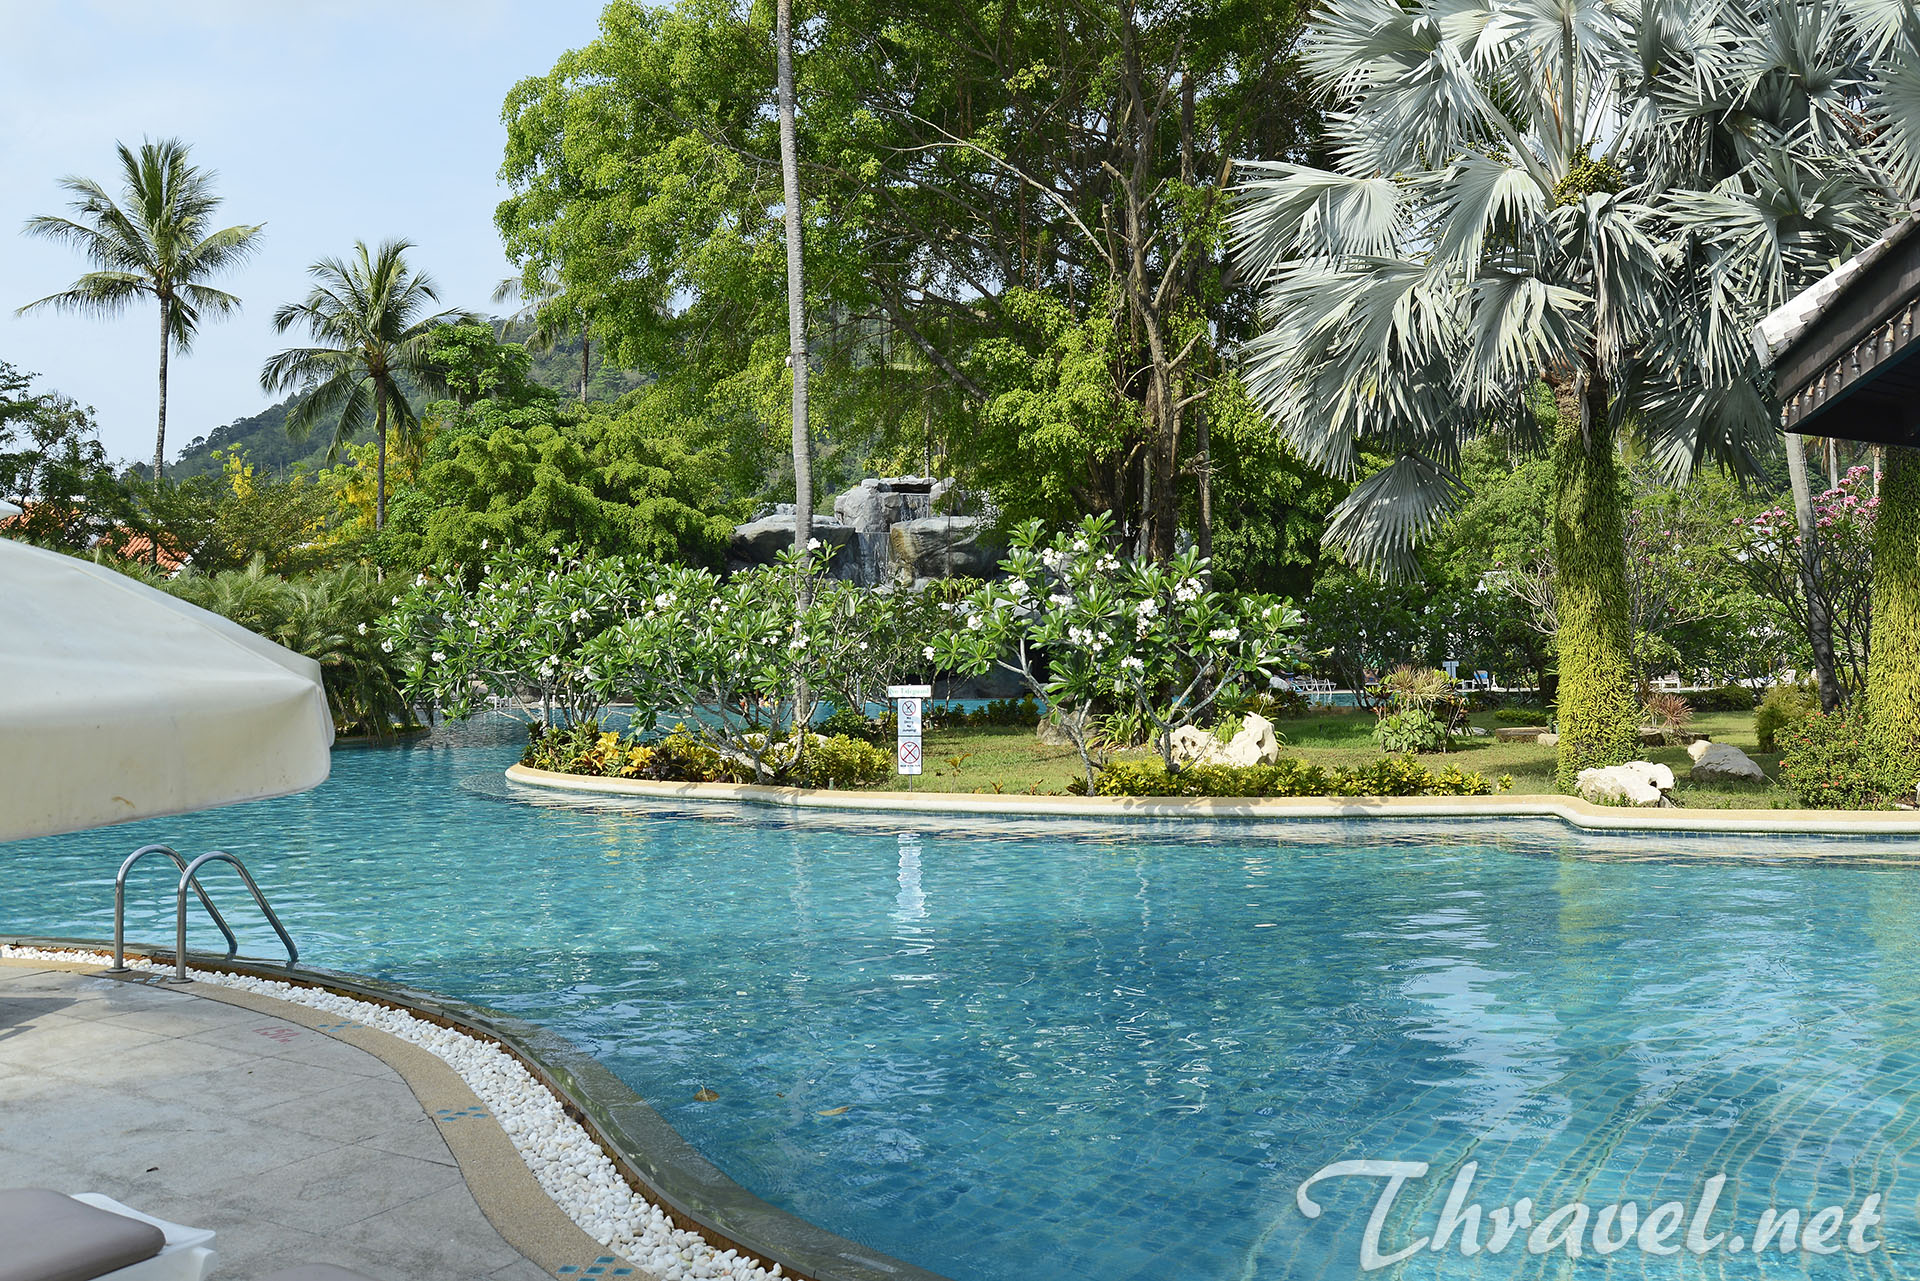 duangjitt-resort-and-spa-hotel-patong-beach-phuket-thailand-14